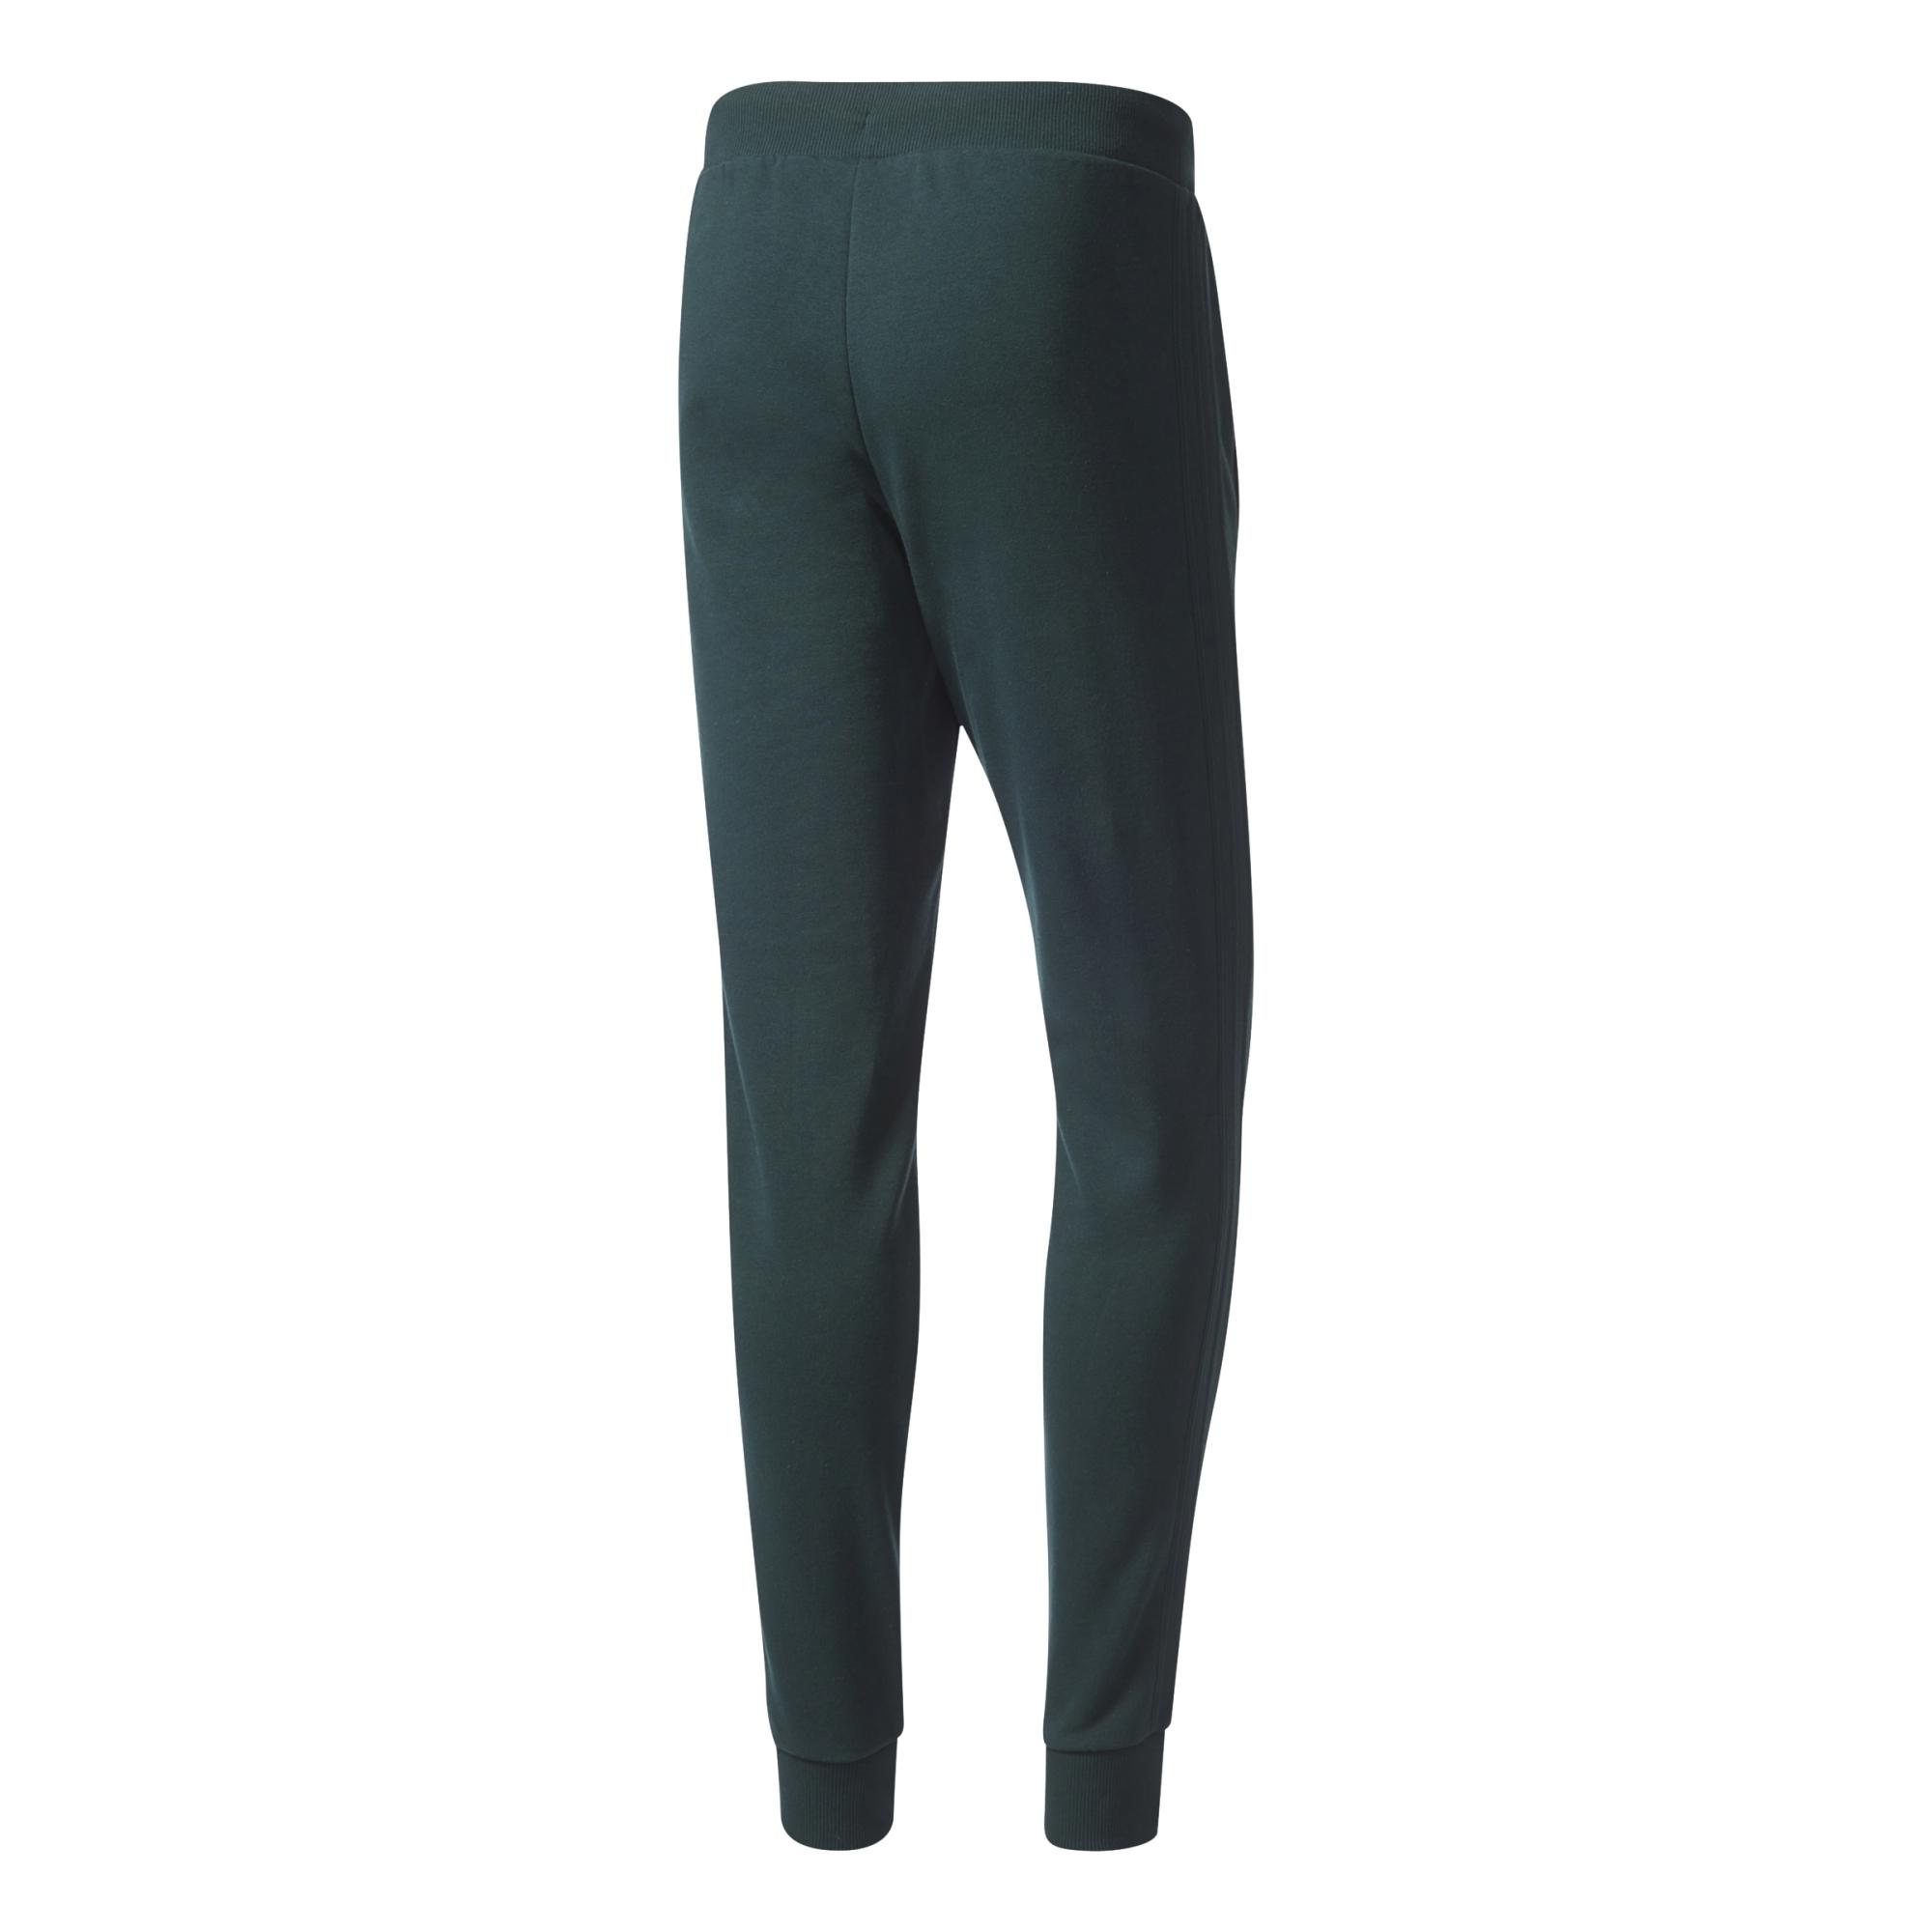 8f6cc44ba1c5 Adidas Originals 3 Striped Pant (green night)